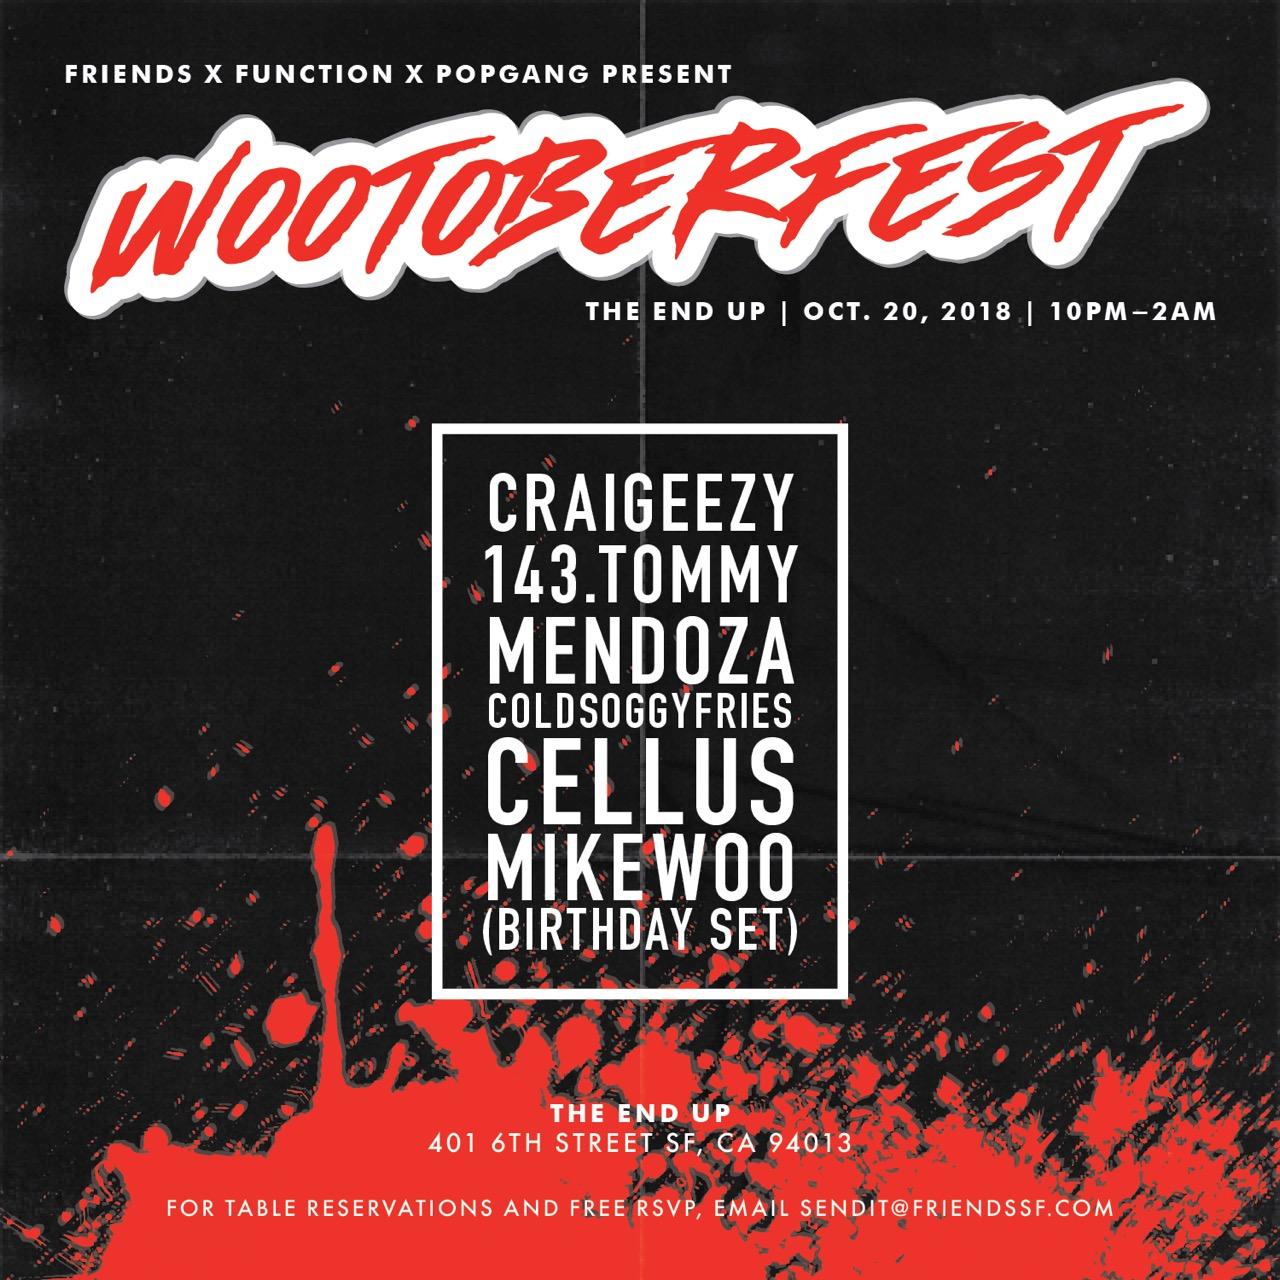 Wootoberfest